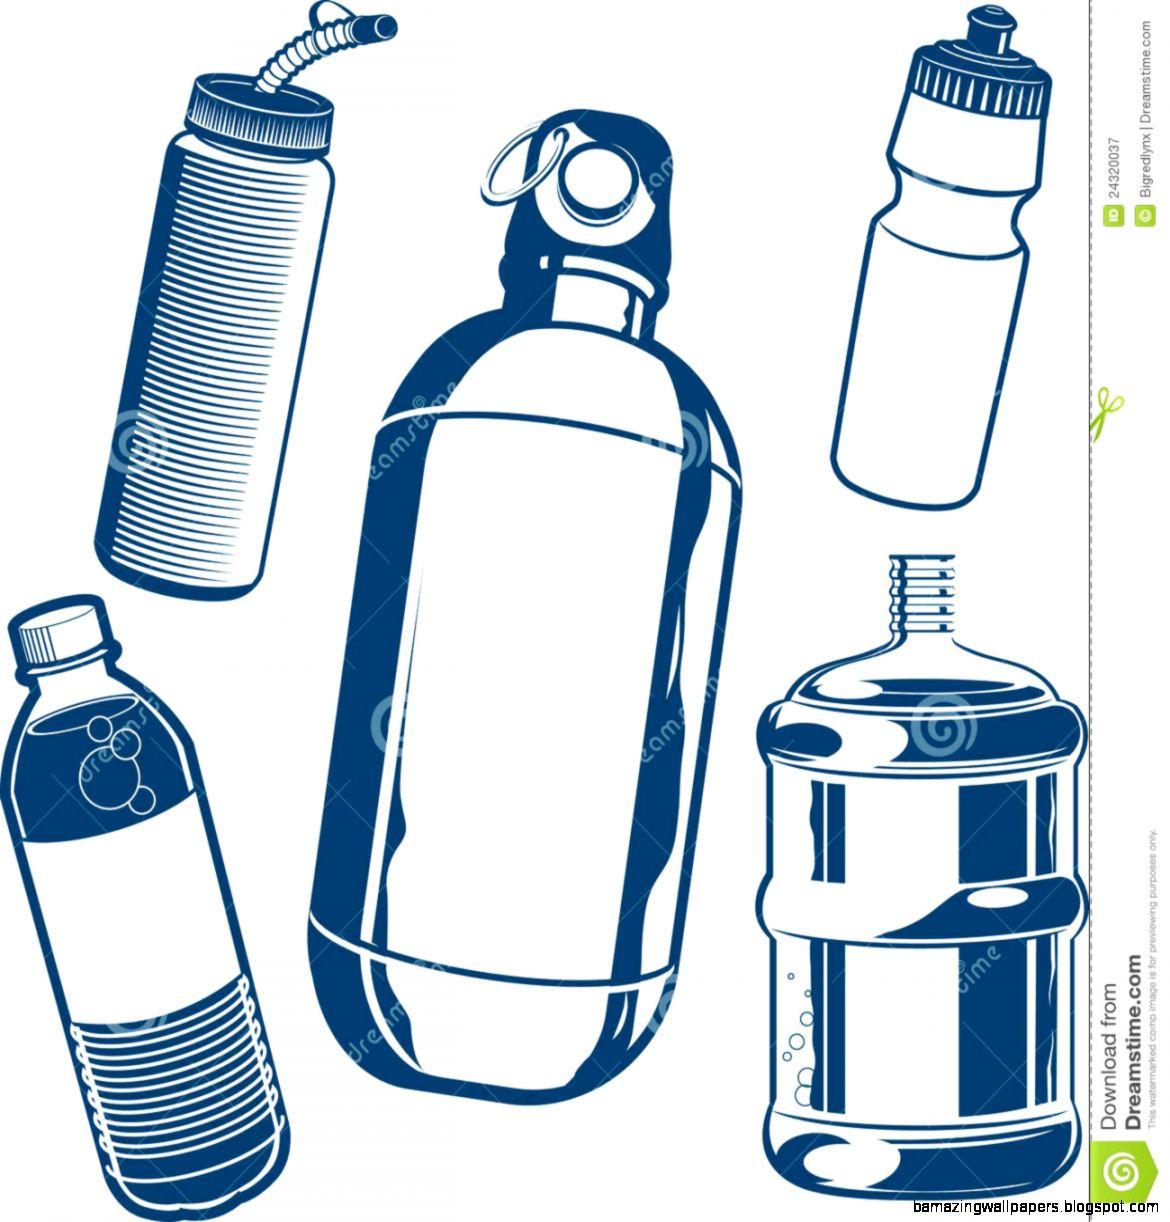 Water bottle coloring page water bottle coloring page clipart panda - View Original Size Reusable Water Bottle Clip Art